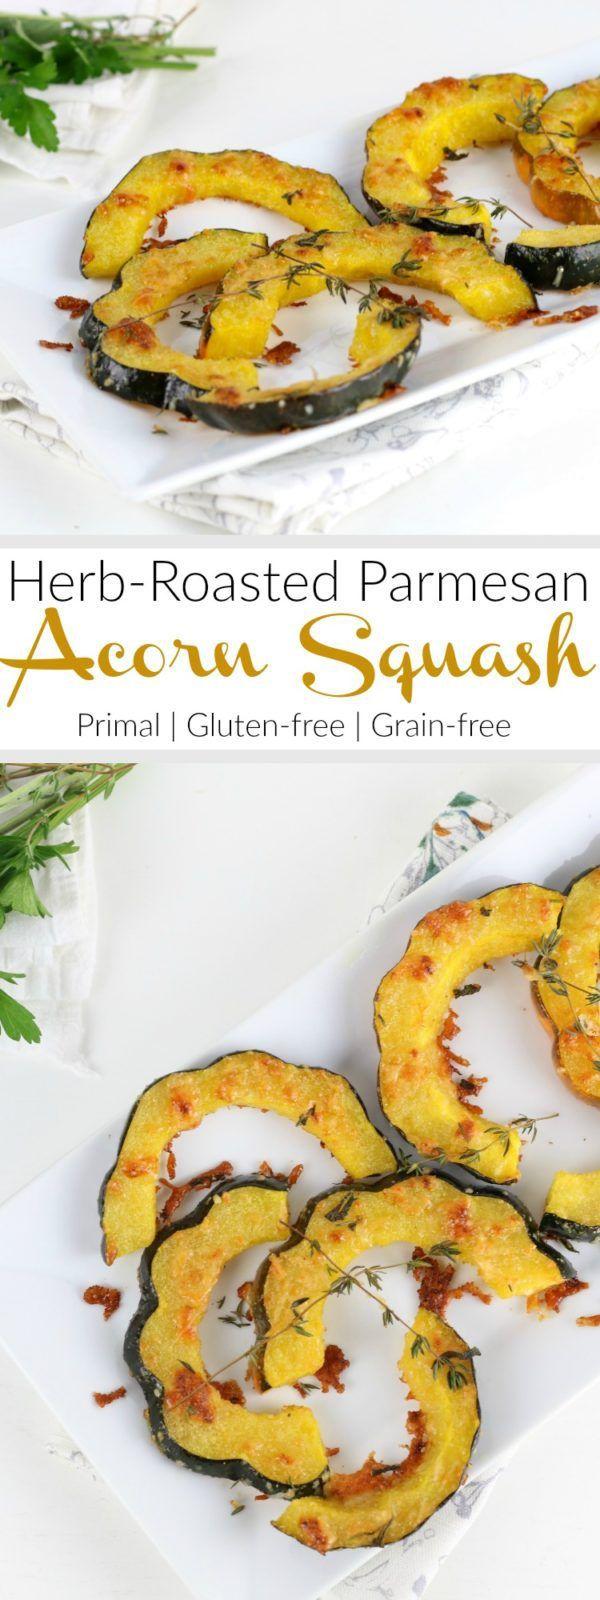 Herb Roasted Parmesan Acorn Squash Recipe Acorn Squash Recipes